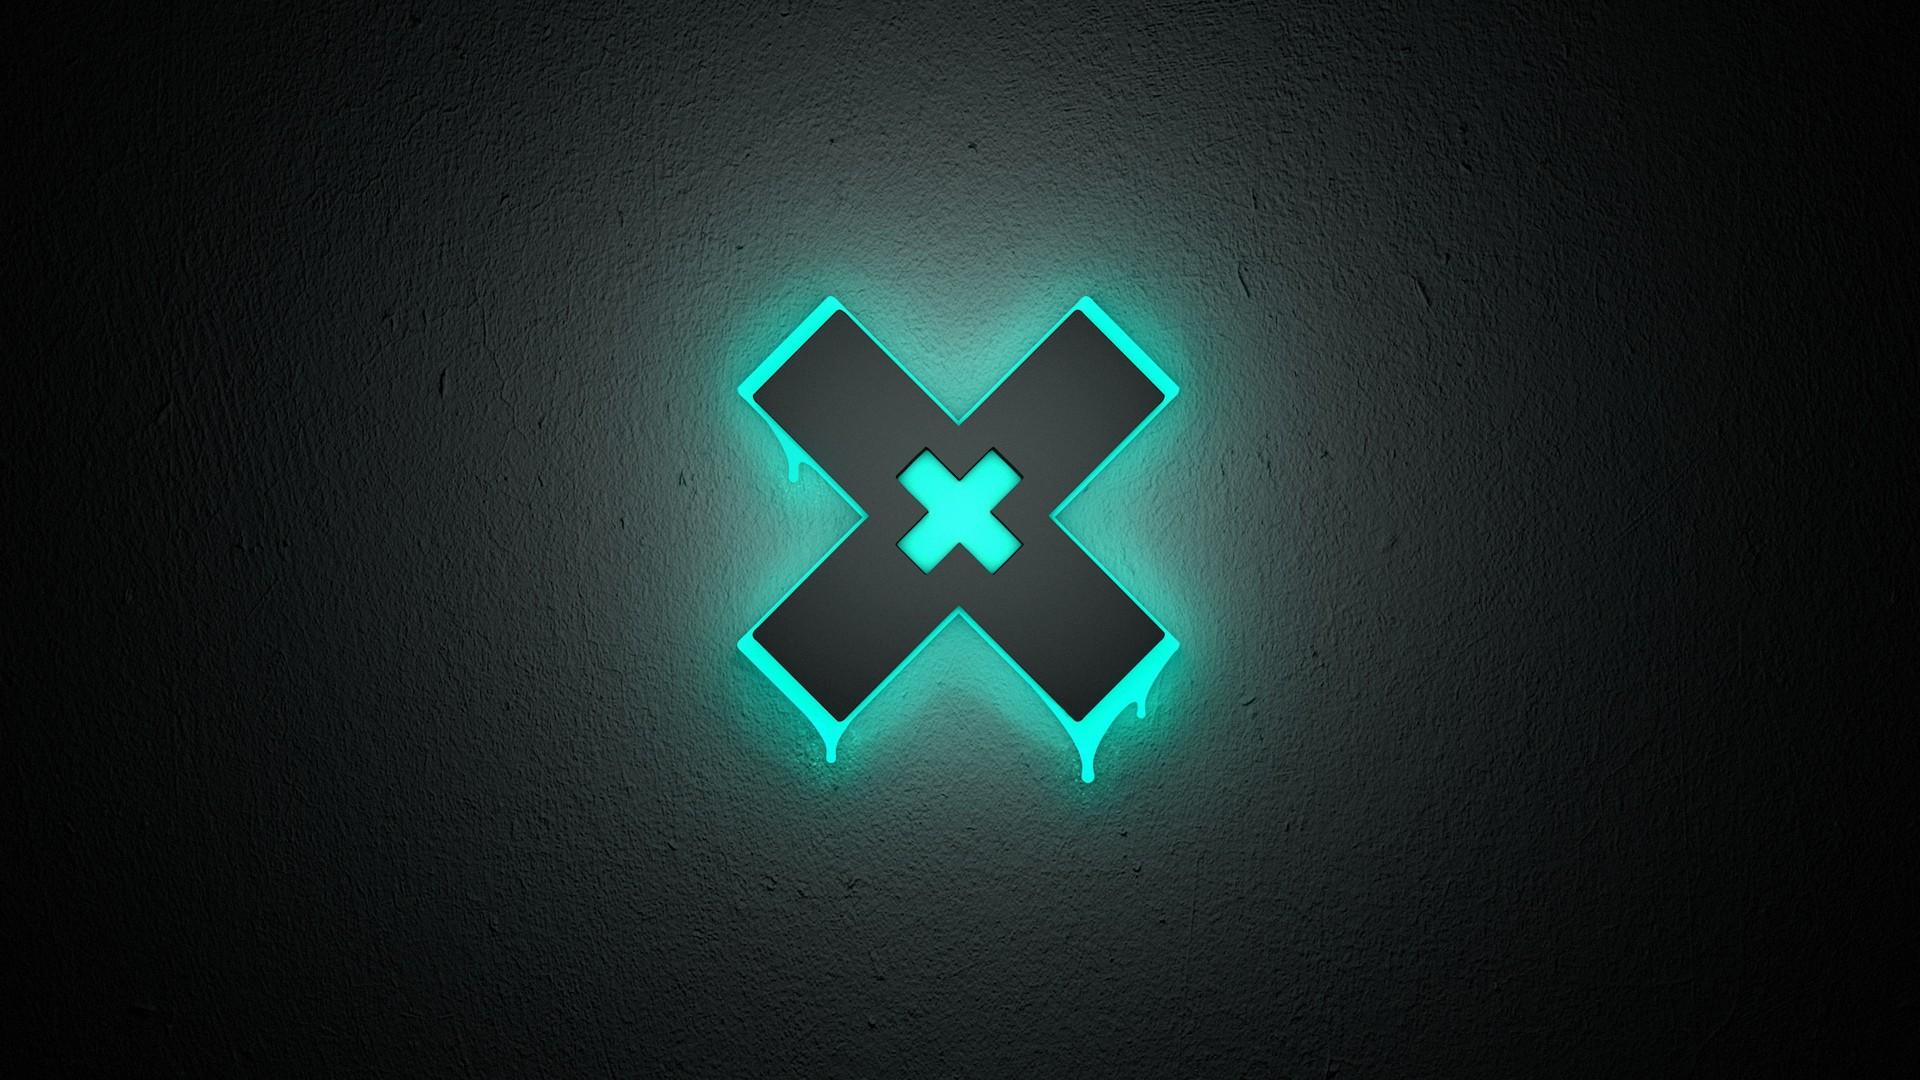 Neon X Black 3D Abstract HD Wallpaper 5816   HD Desktop Wallpapers 1920x1080